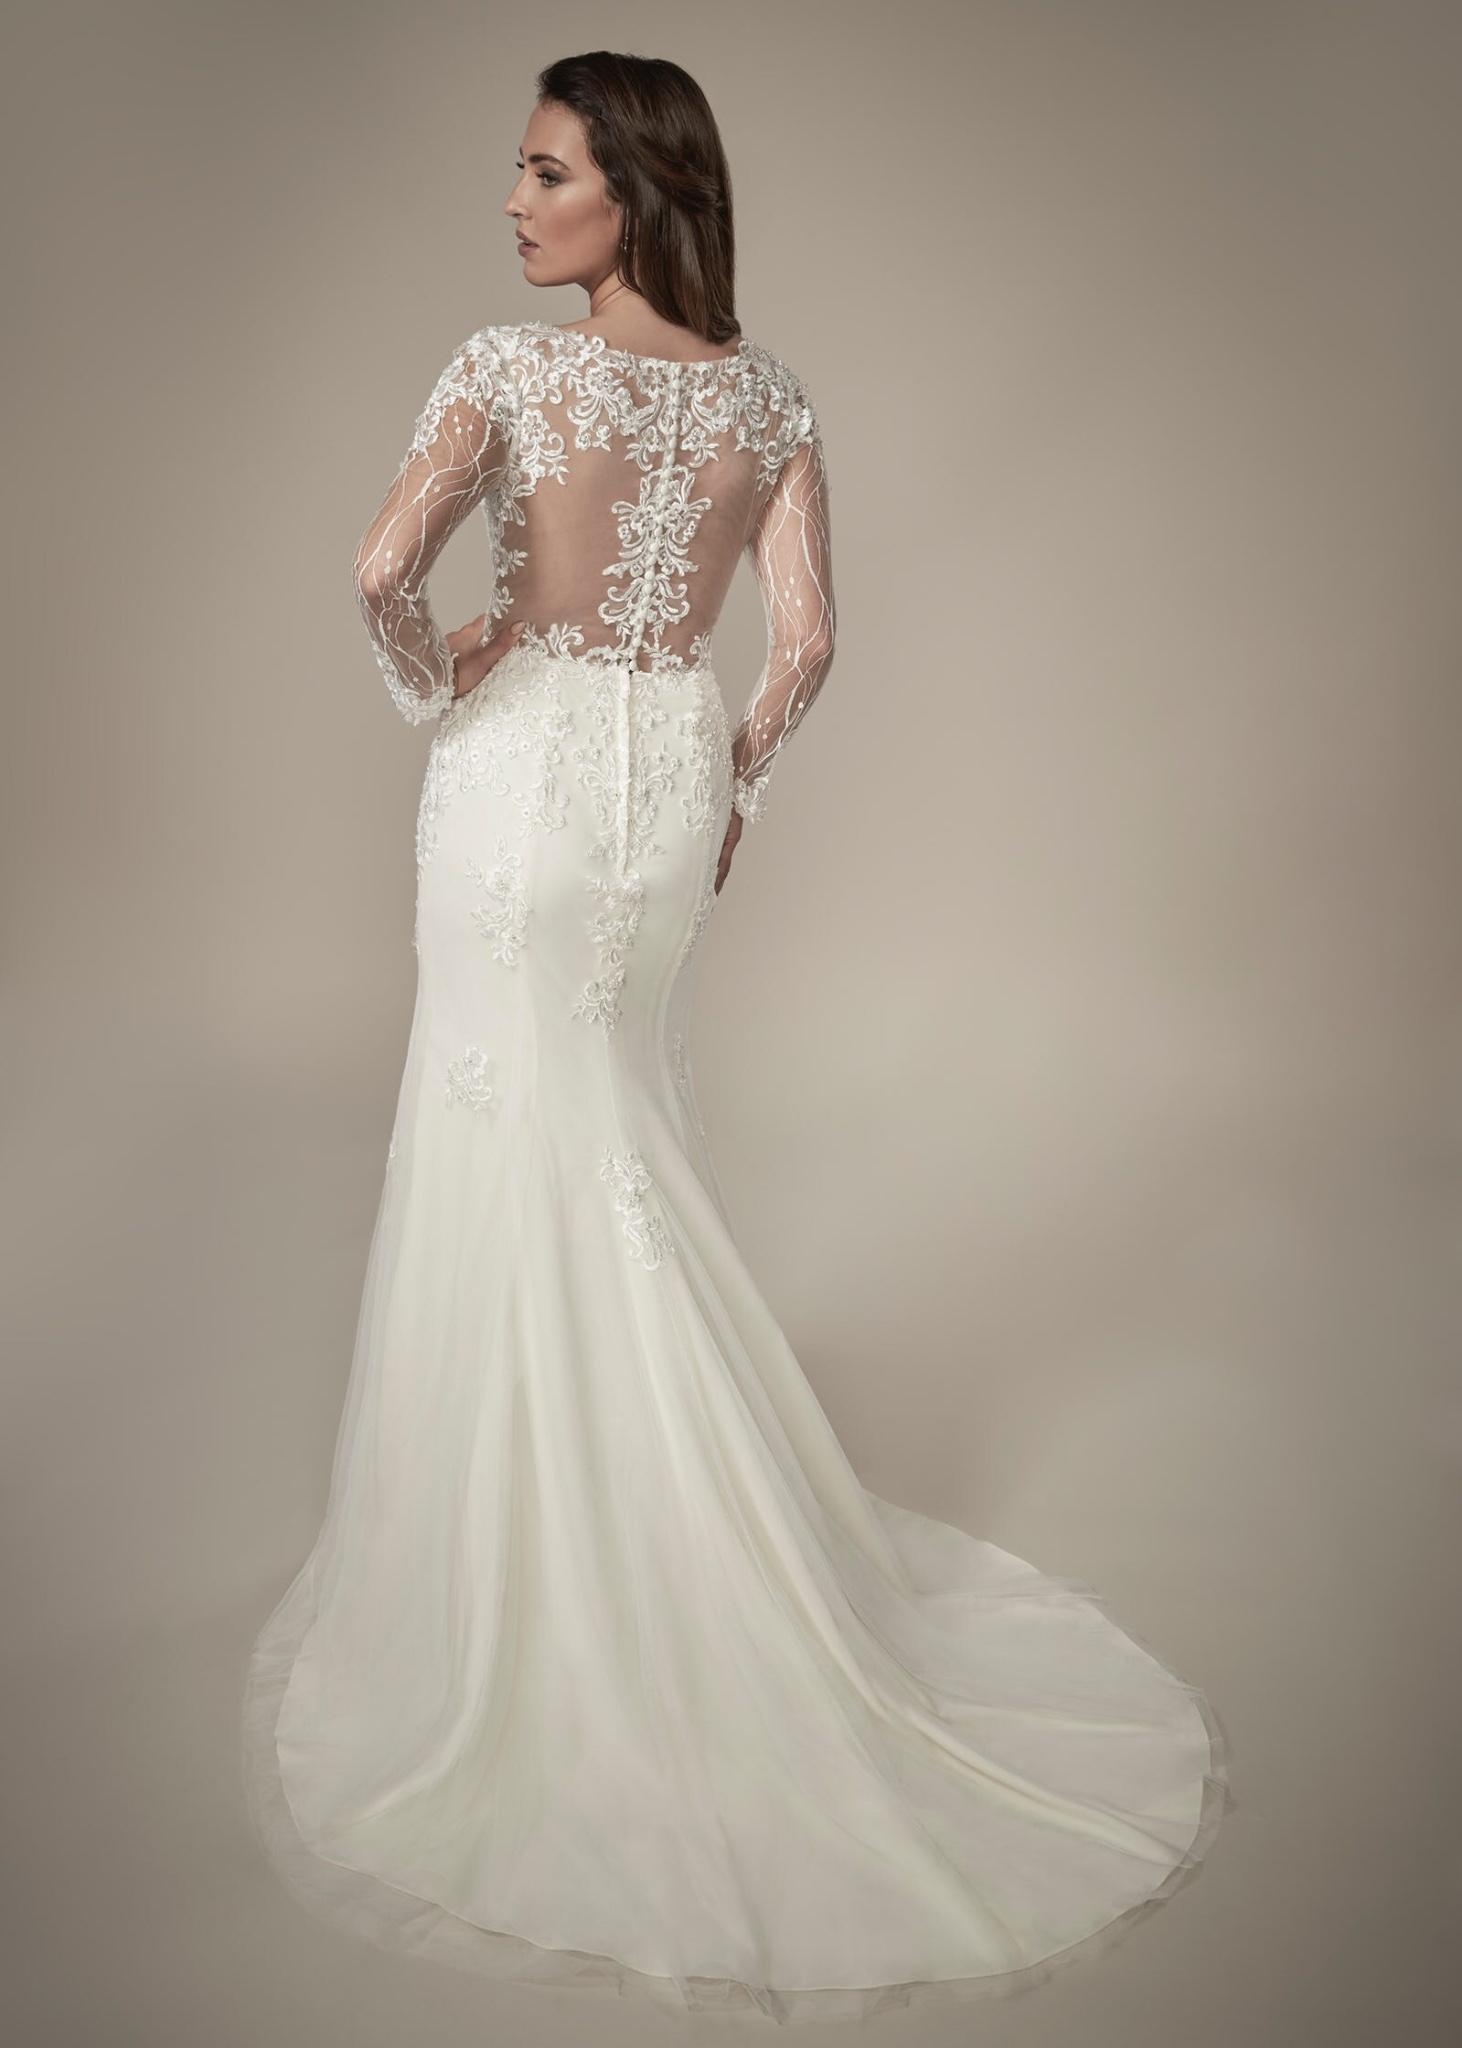 82d0defe1288 Wedding Time, Dorchester - Buy Wedding Clothes